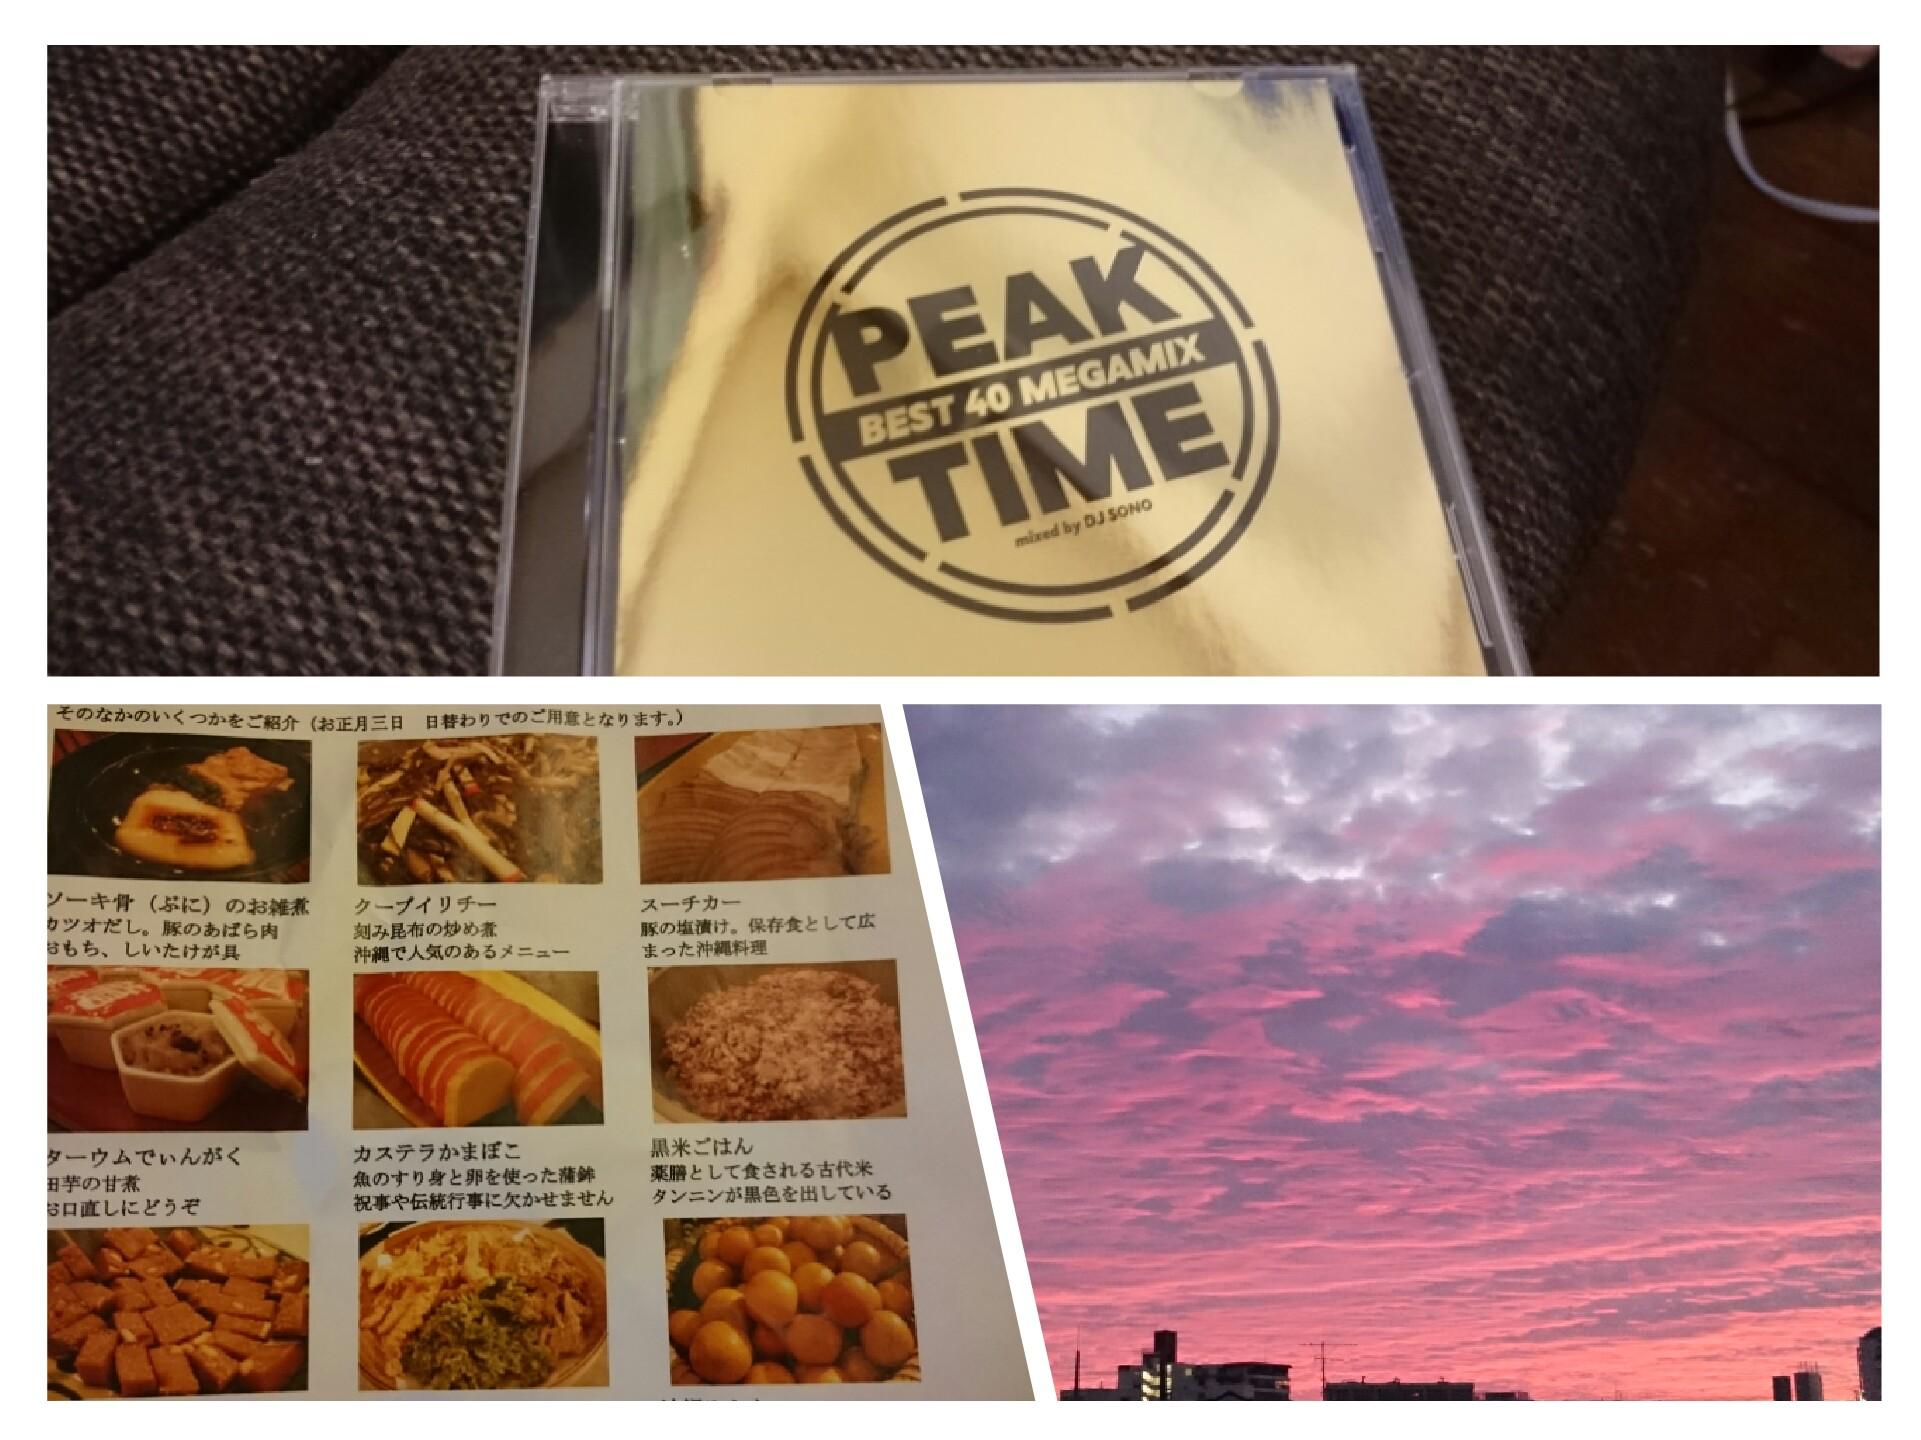 PEAK TIME BEST 40 Megamix 洋楽コンピレーション 正月特別沖縄朝食料理 那覇